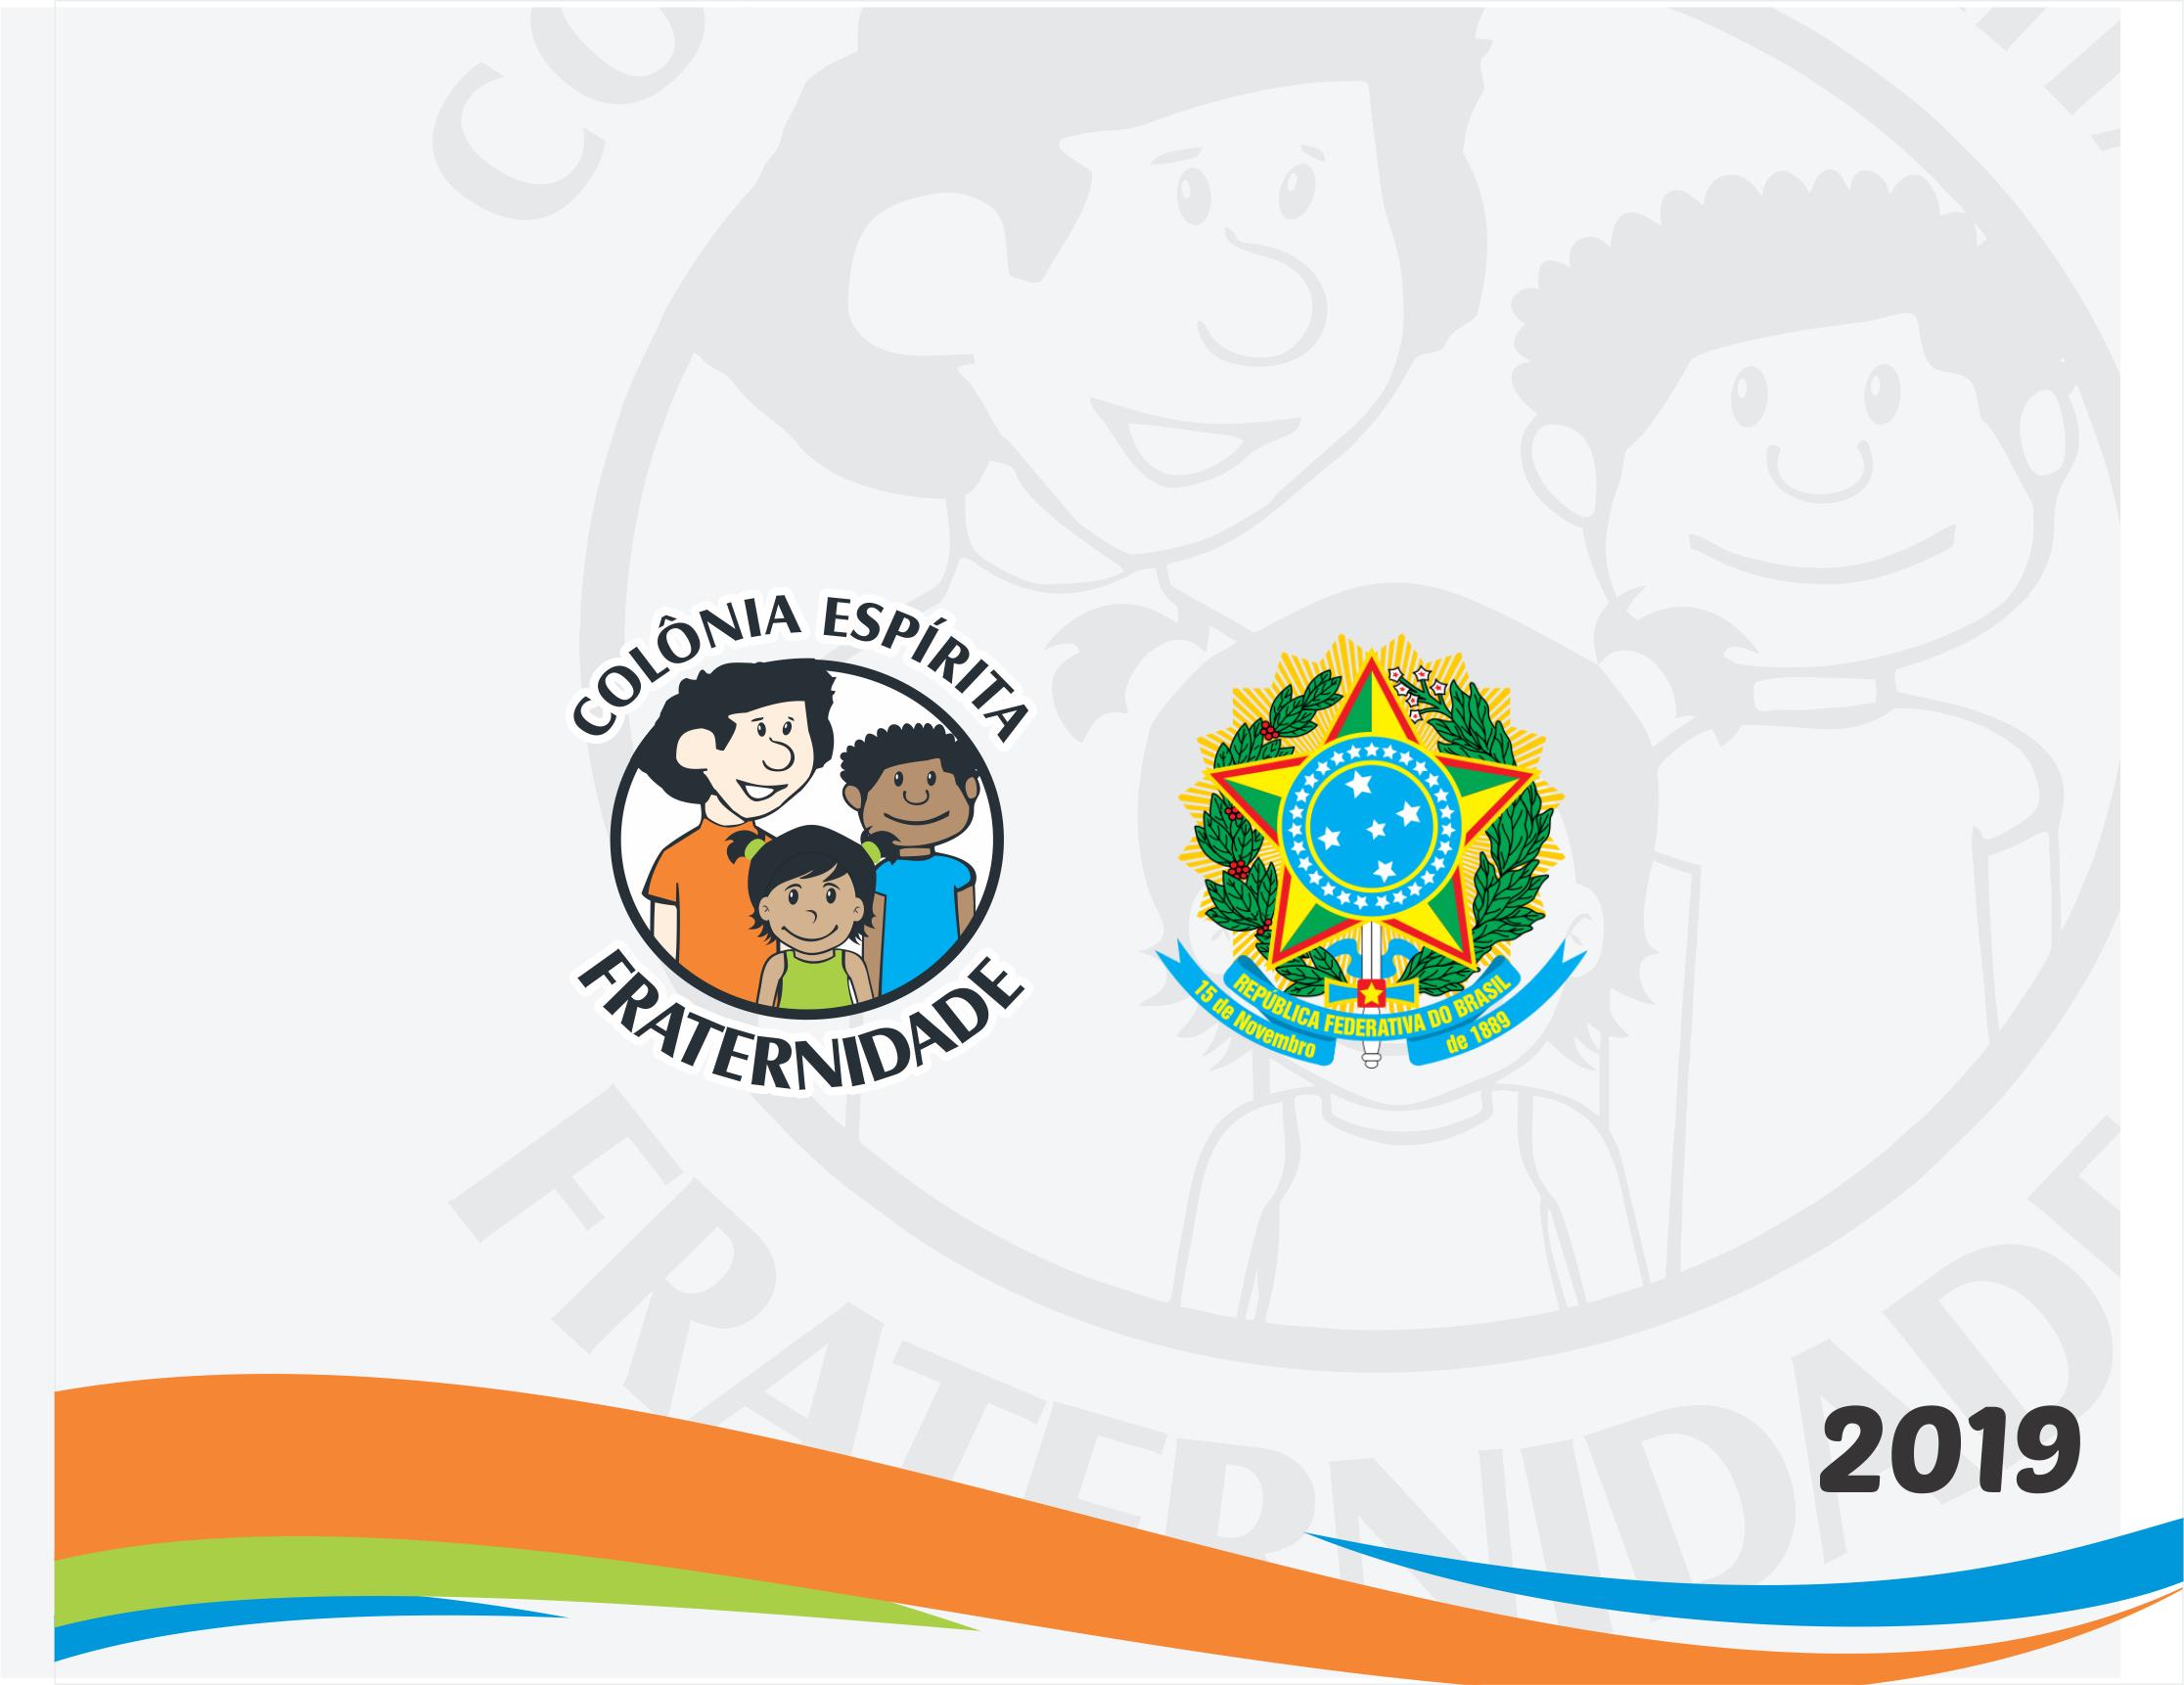 Capa Ata federal 2019